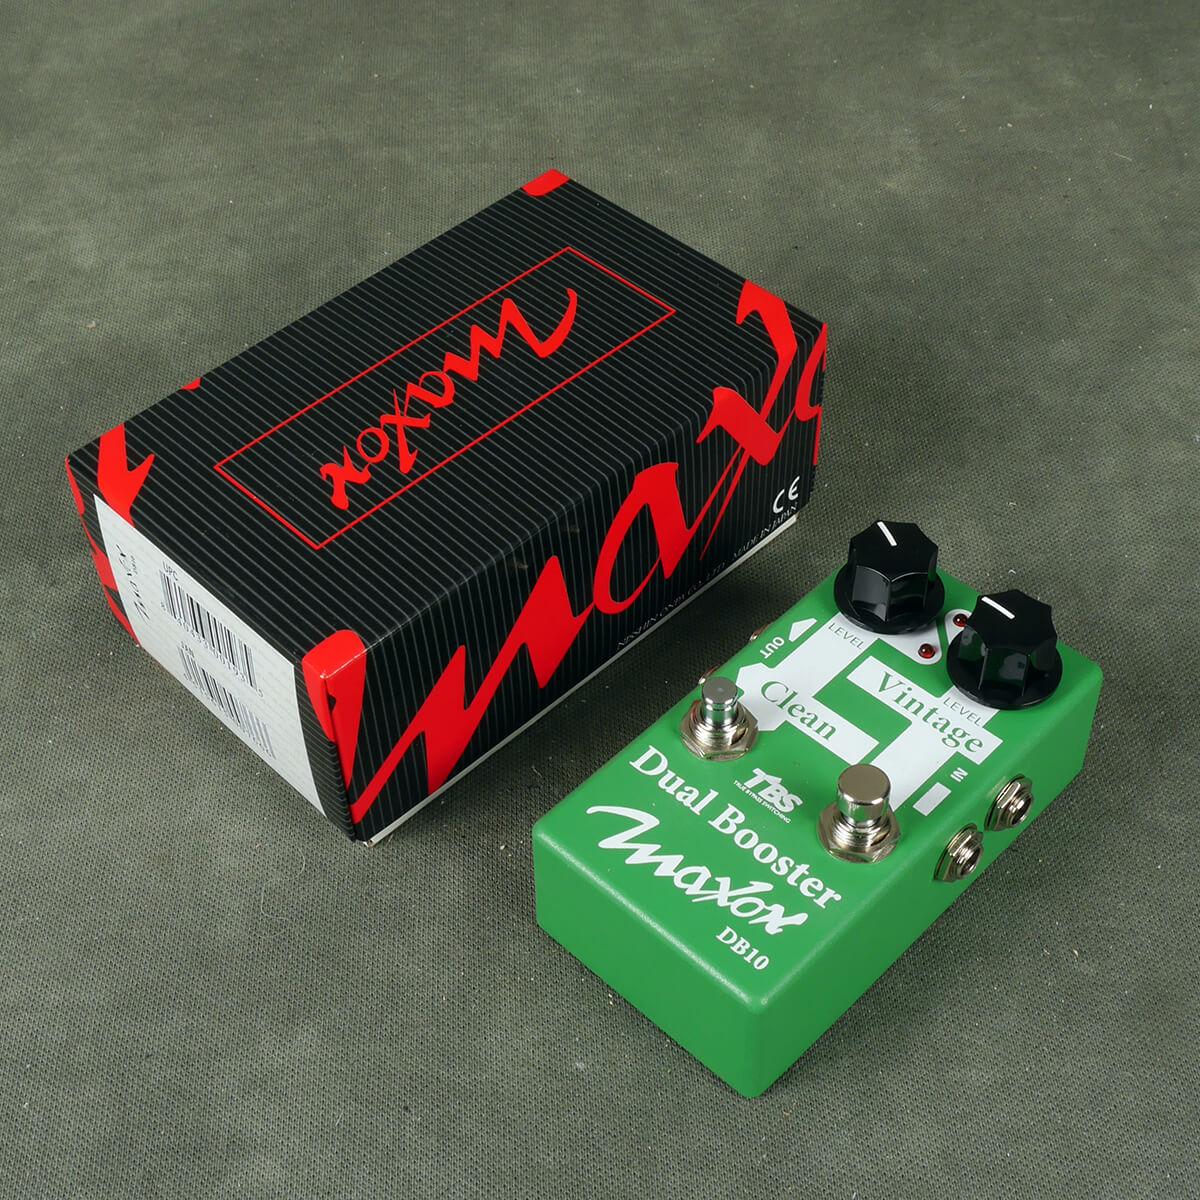 Maxon DB10 Dual Booster FX Pedal w/Box - 2nd Hand